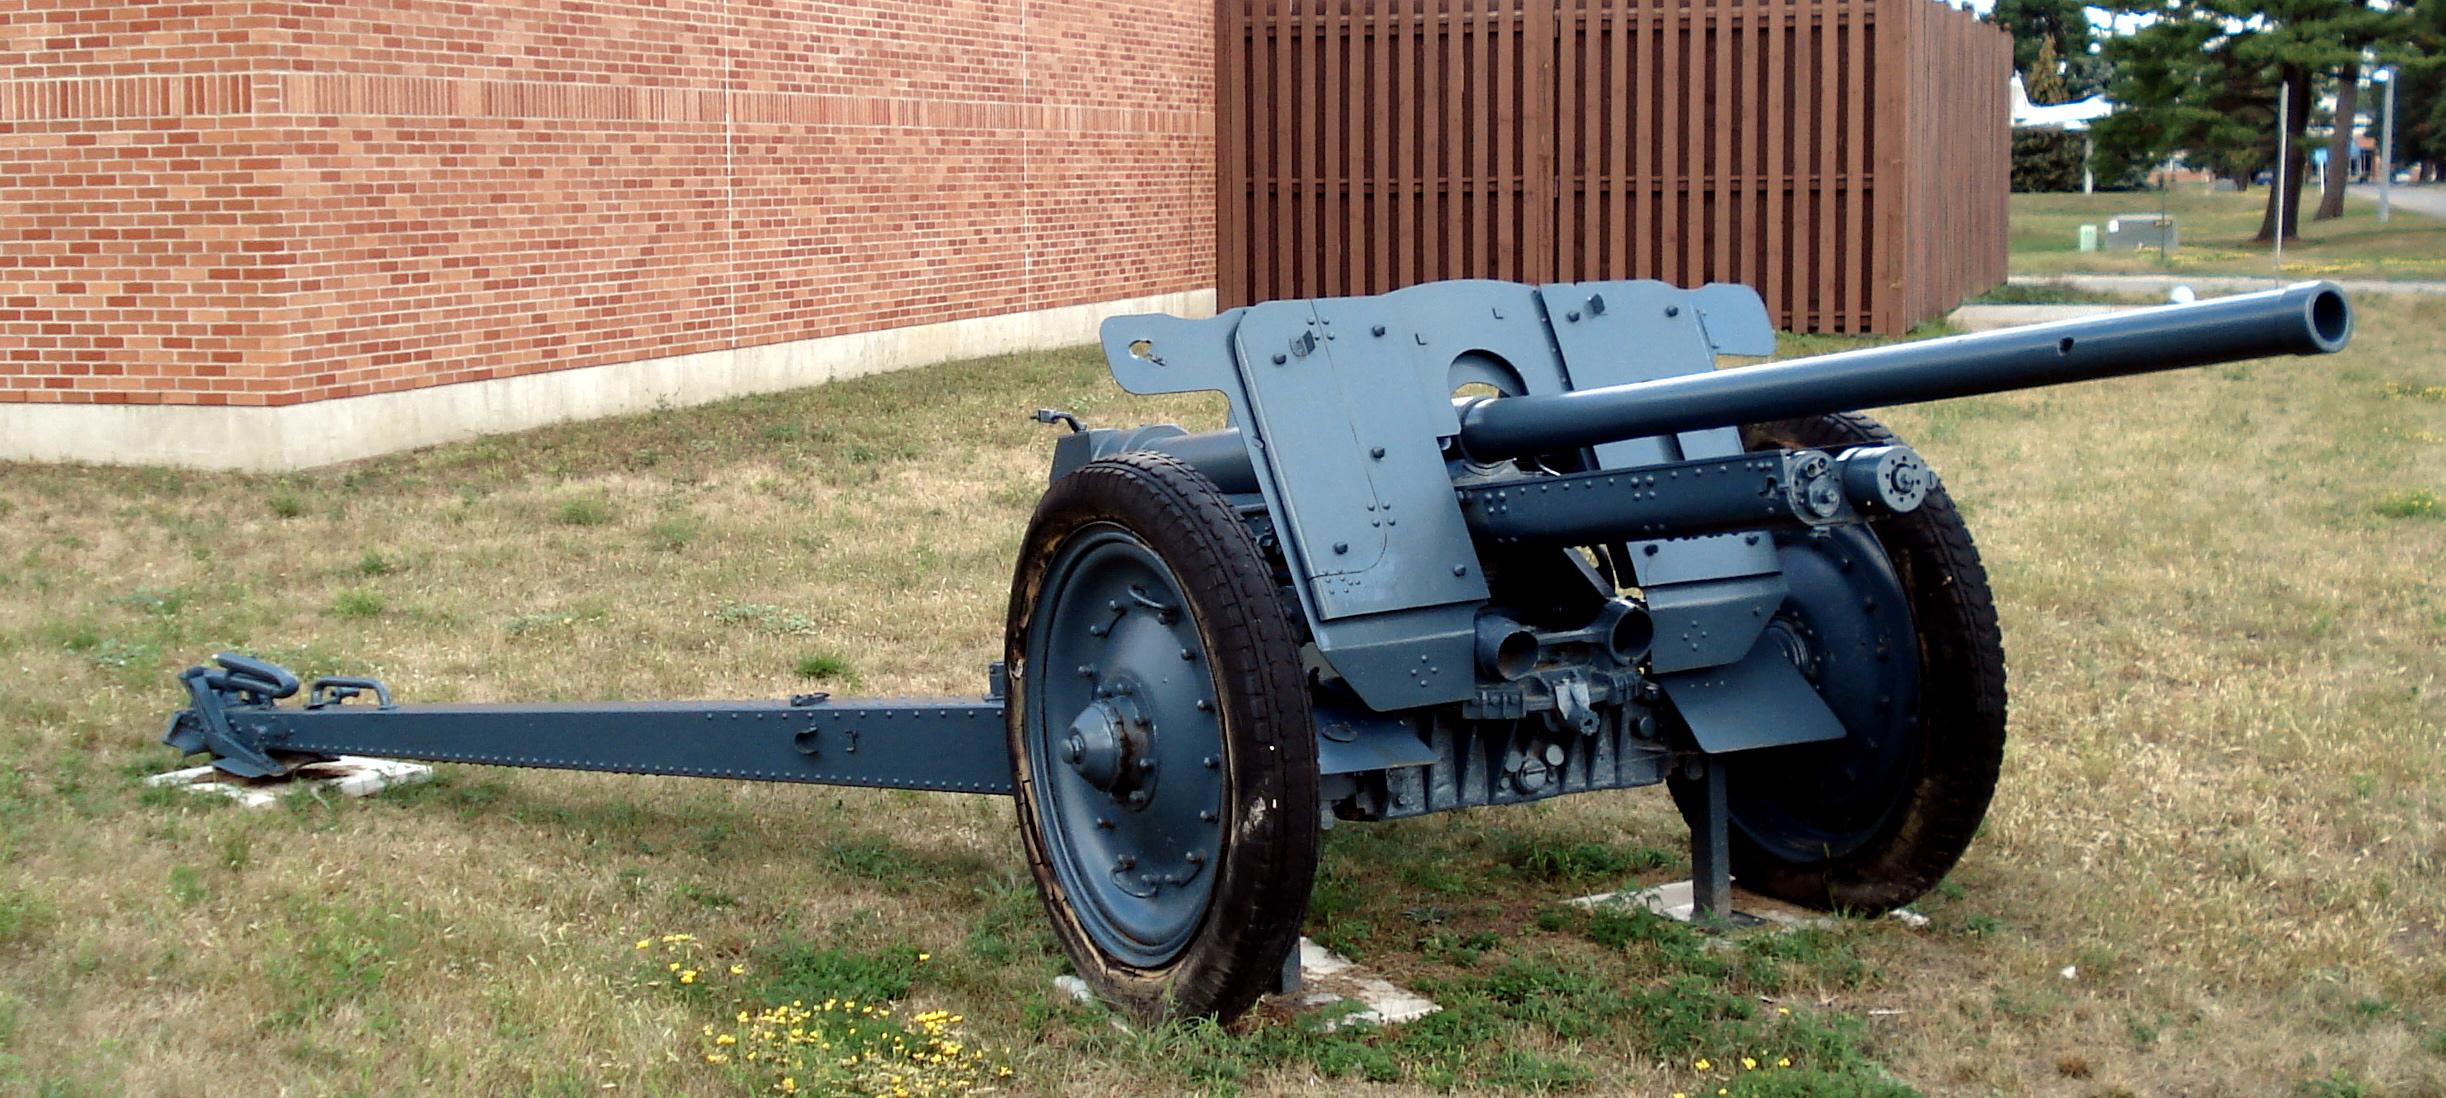 German 50 Mm Anti Tank Gun: File:PaK 36r Cfb Borden 3.jpg